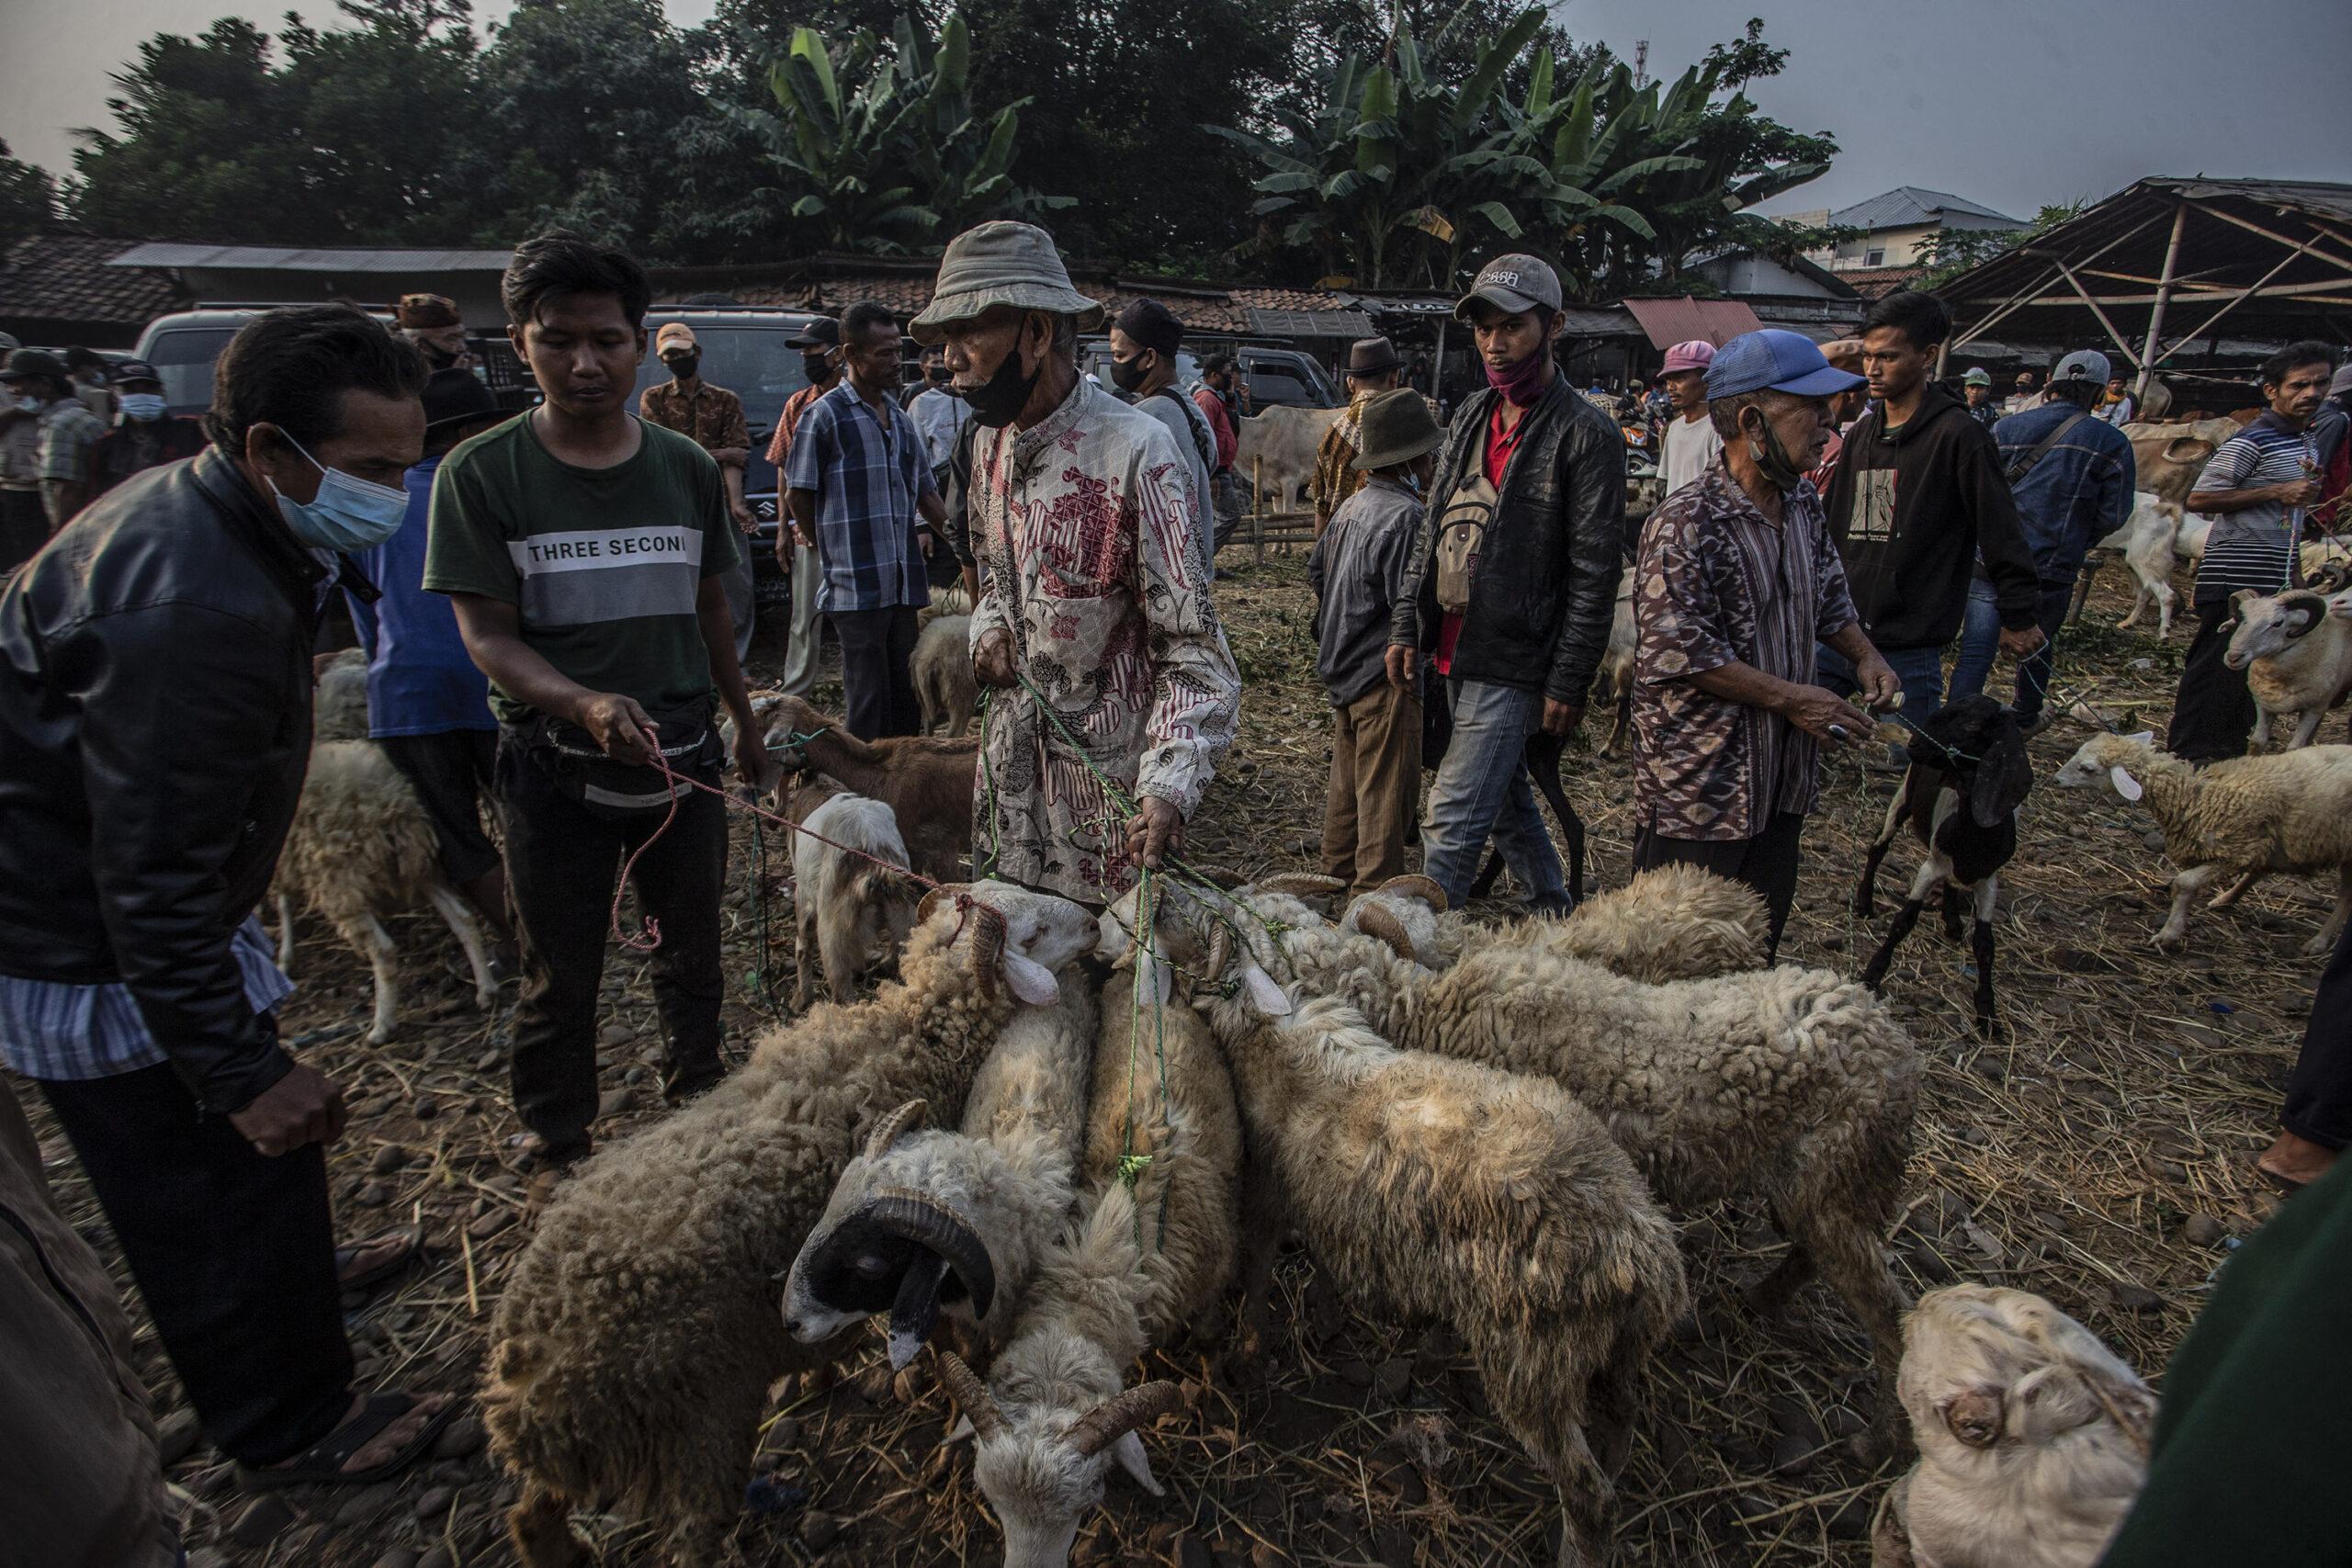 Indonesians gather to pray for Eid al-Adha despite virus surge